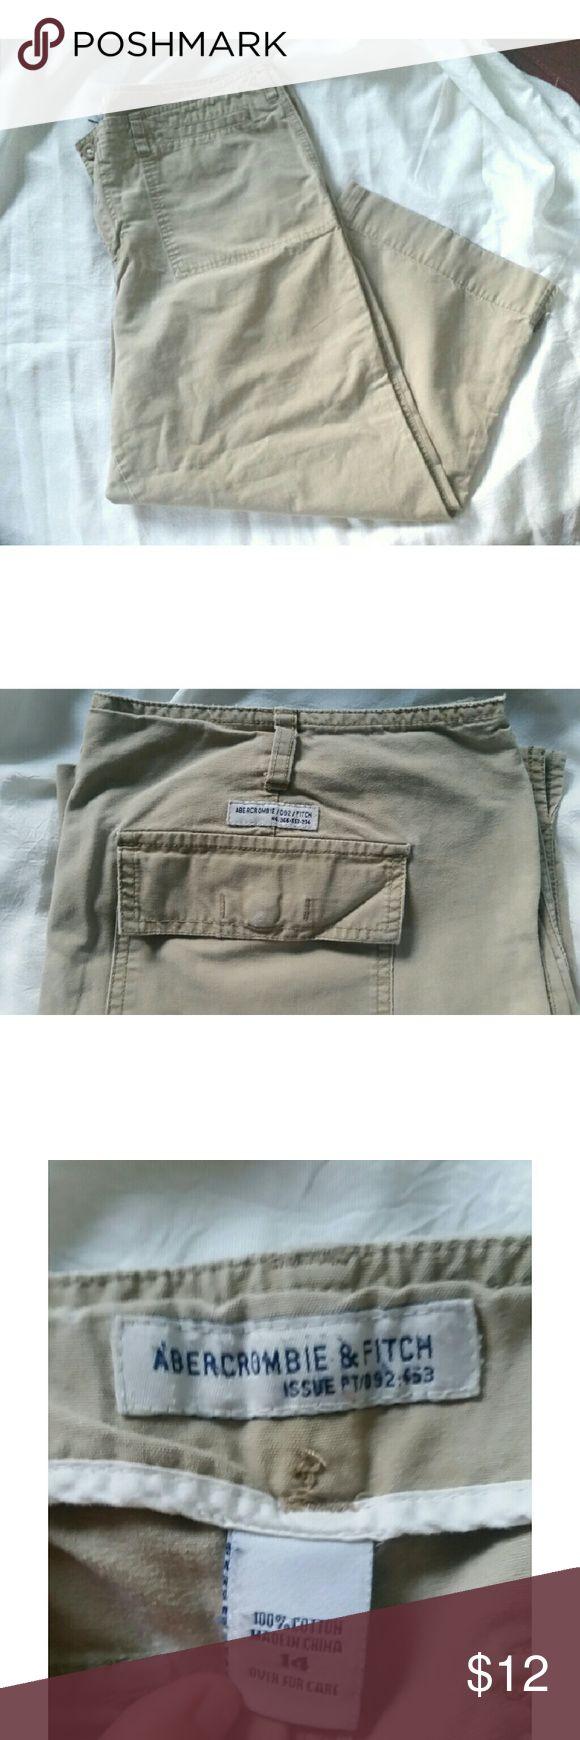 Abercrombie  & Fitch Khaki Capris Abercrombie  & Fitch Khaki Capris. Size 14. Excellent. Condition.  Reasonable offers accepted. Old Navy Pants Capris